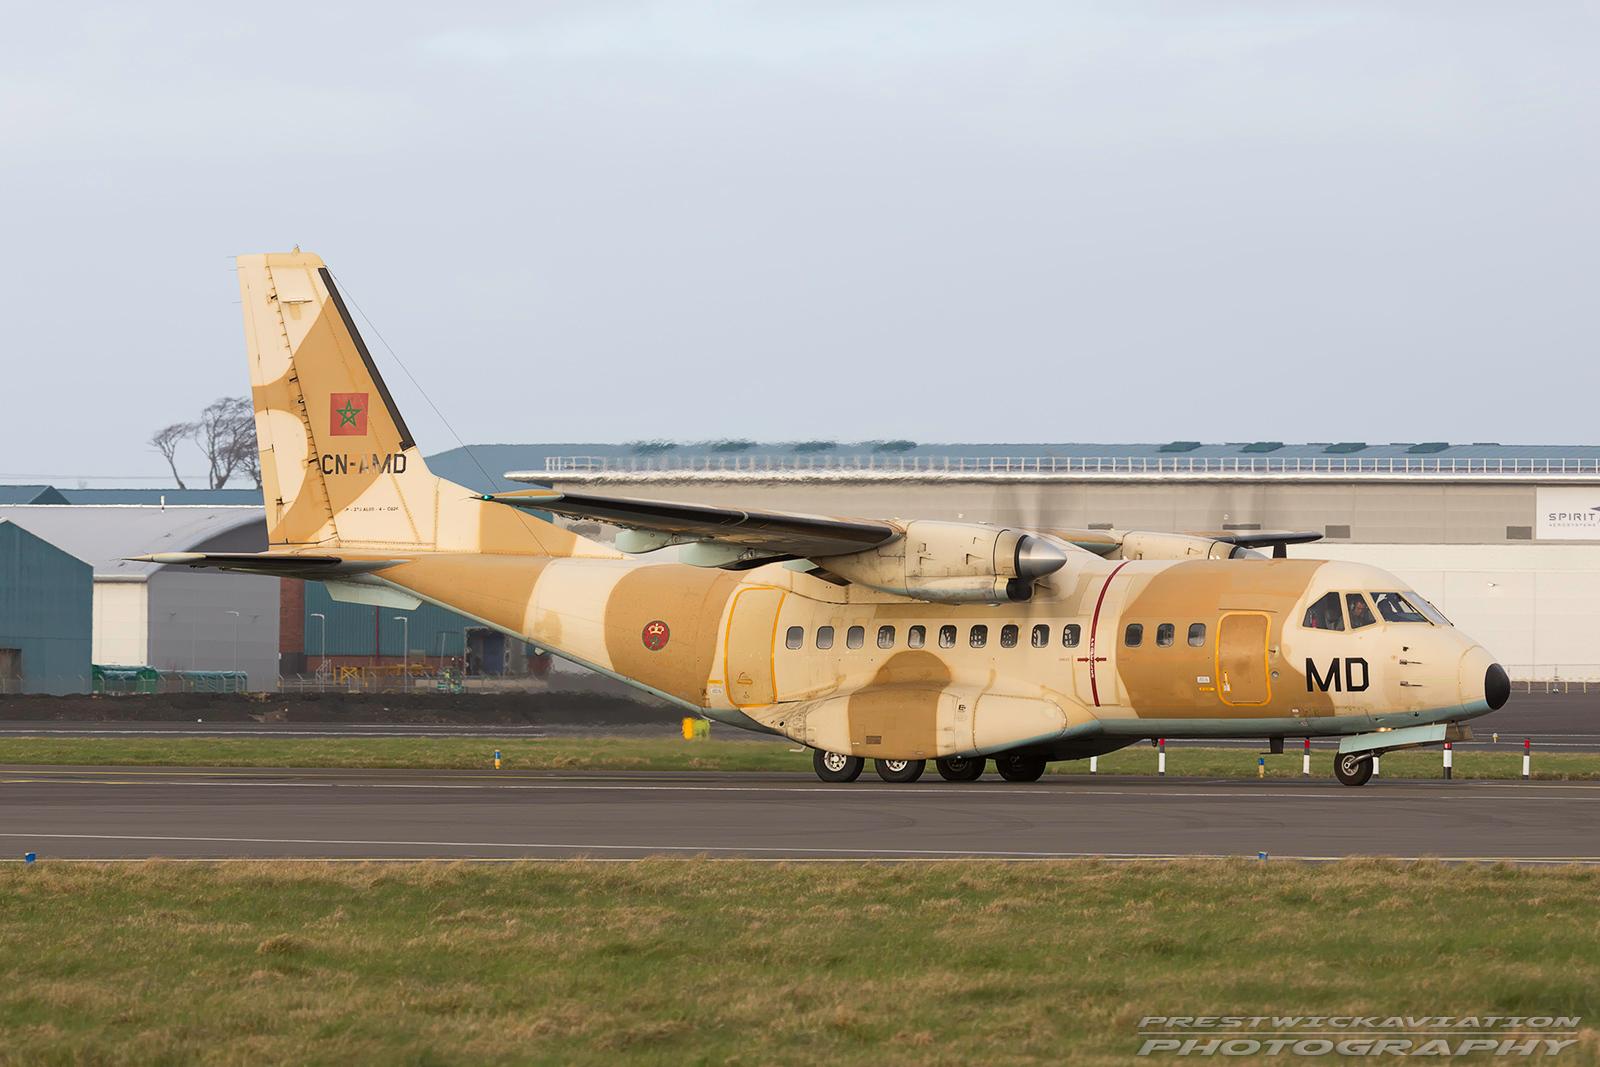 FRA: Photos d'avions de transport - Page 31 CN-AMD%20CASA%20CN-235M-100%20Morrocan%20Air%20Force%20Prestwick%20080317-O